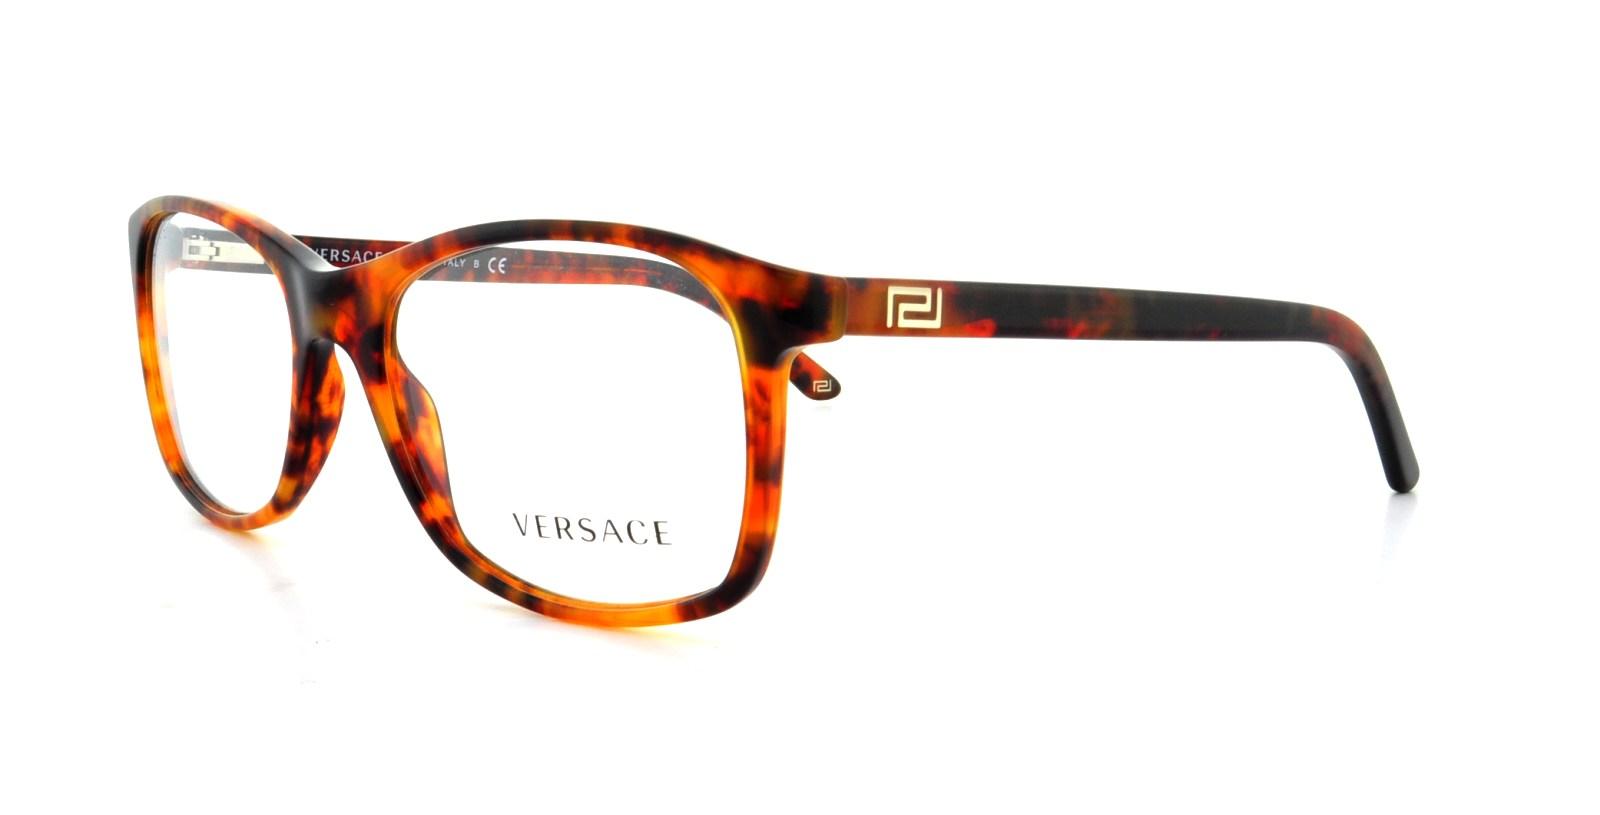 74e0a48fe39 Designer Glasses Frames Outlet - Bitterroot Public Library